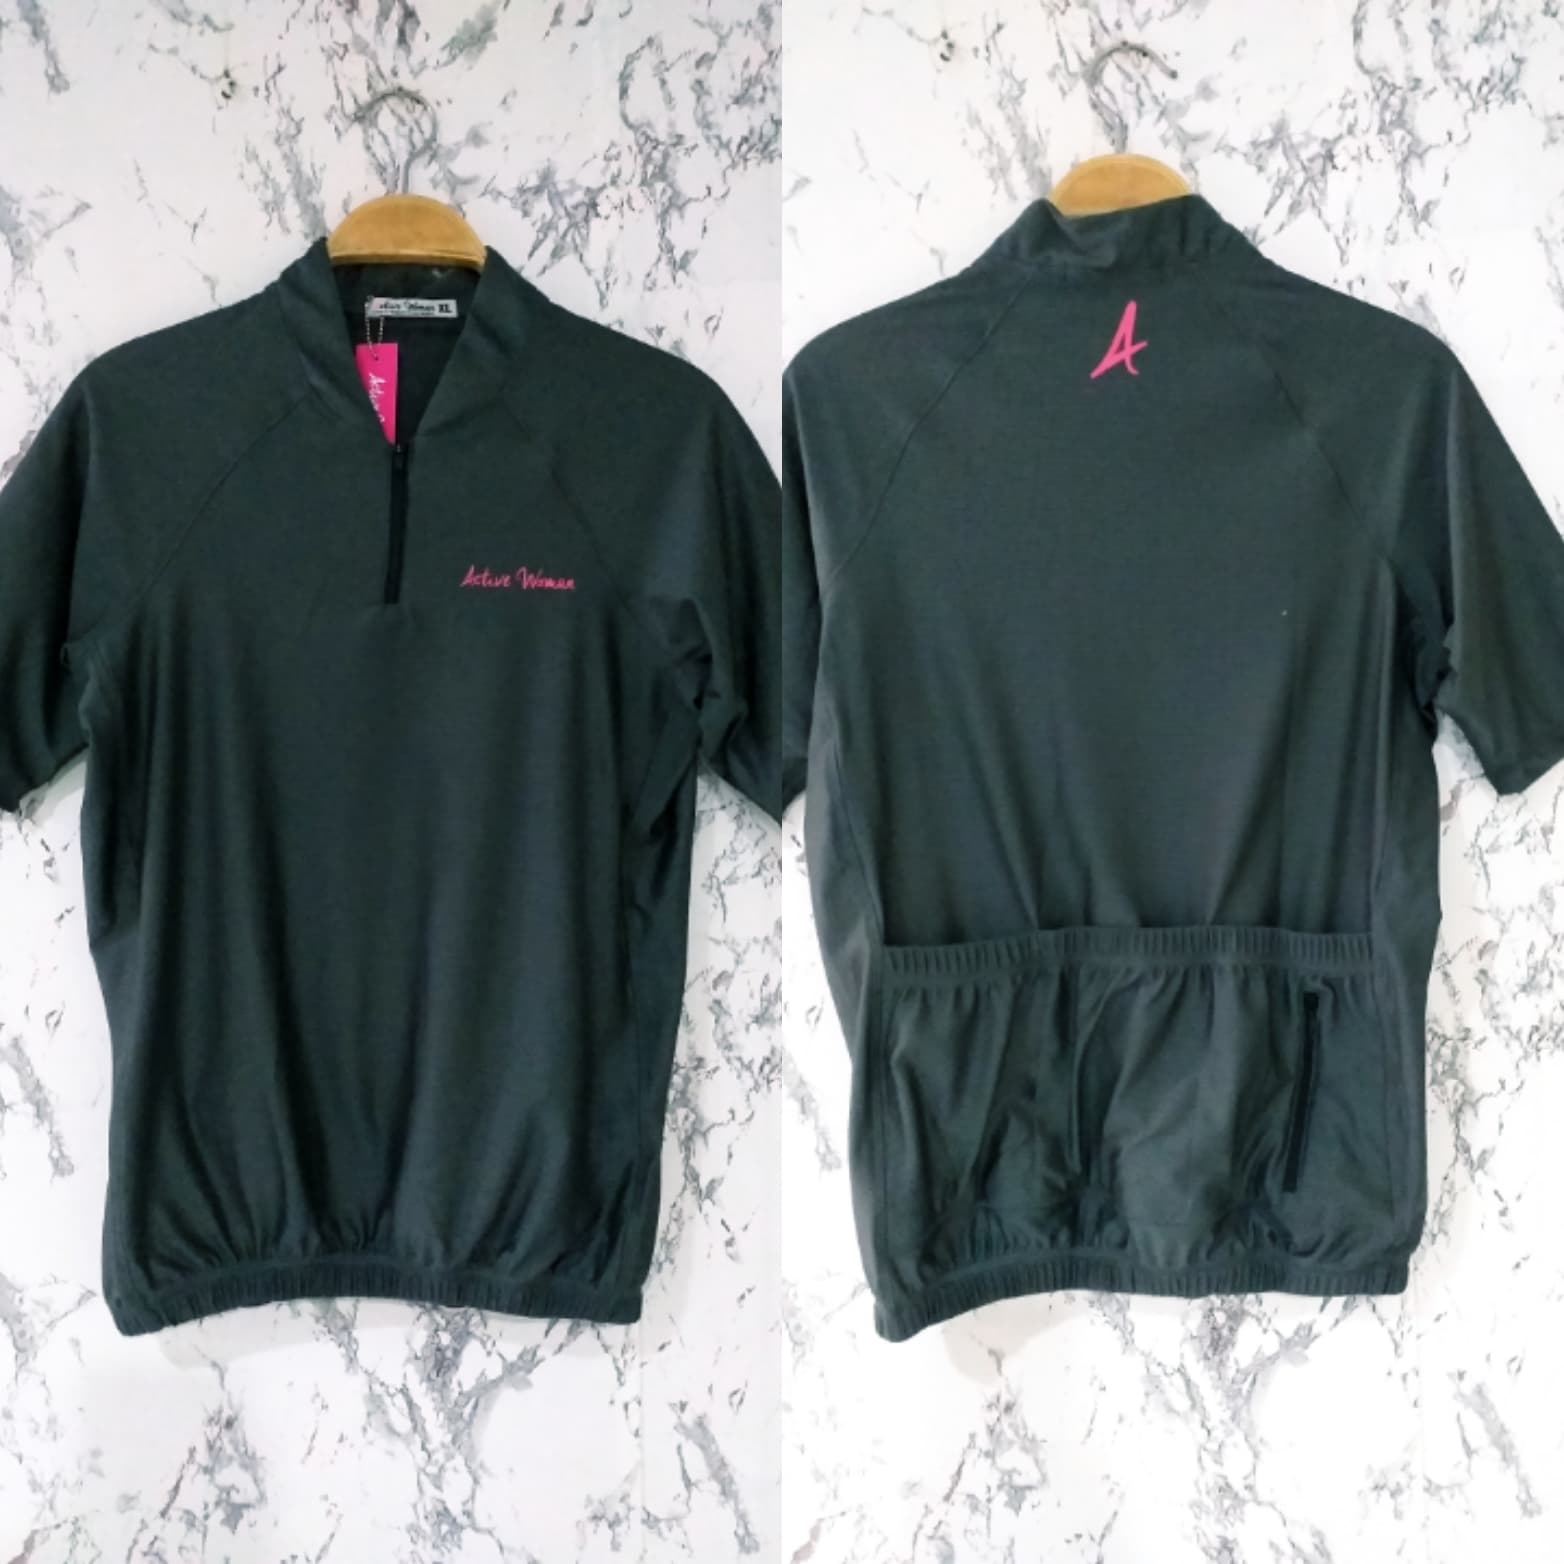 Philiprint Short Sleeves Shirt Bike Jersey Active Woman